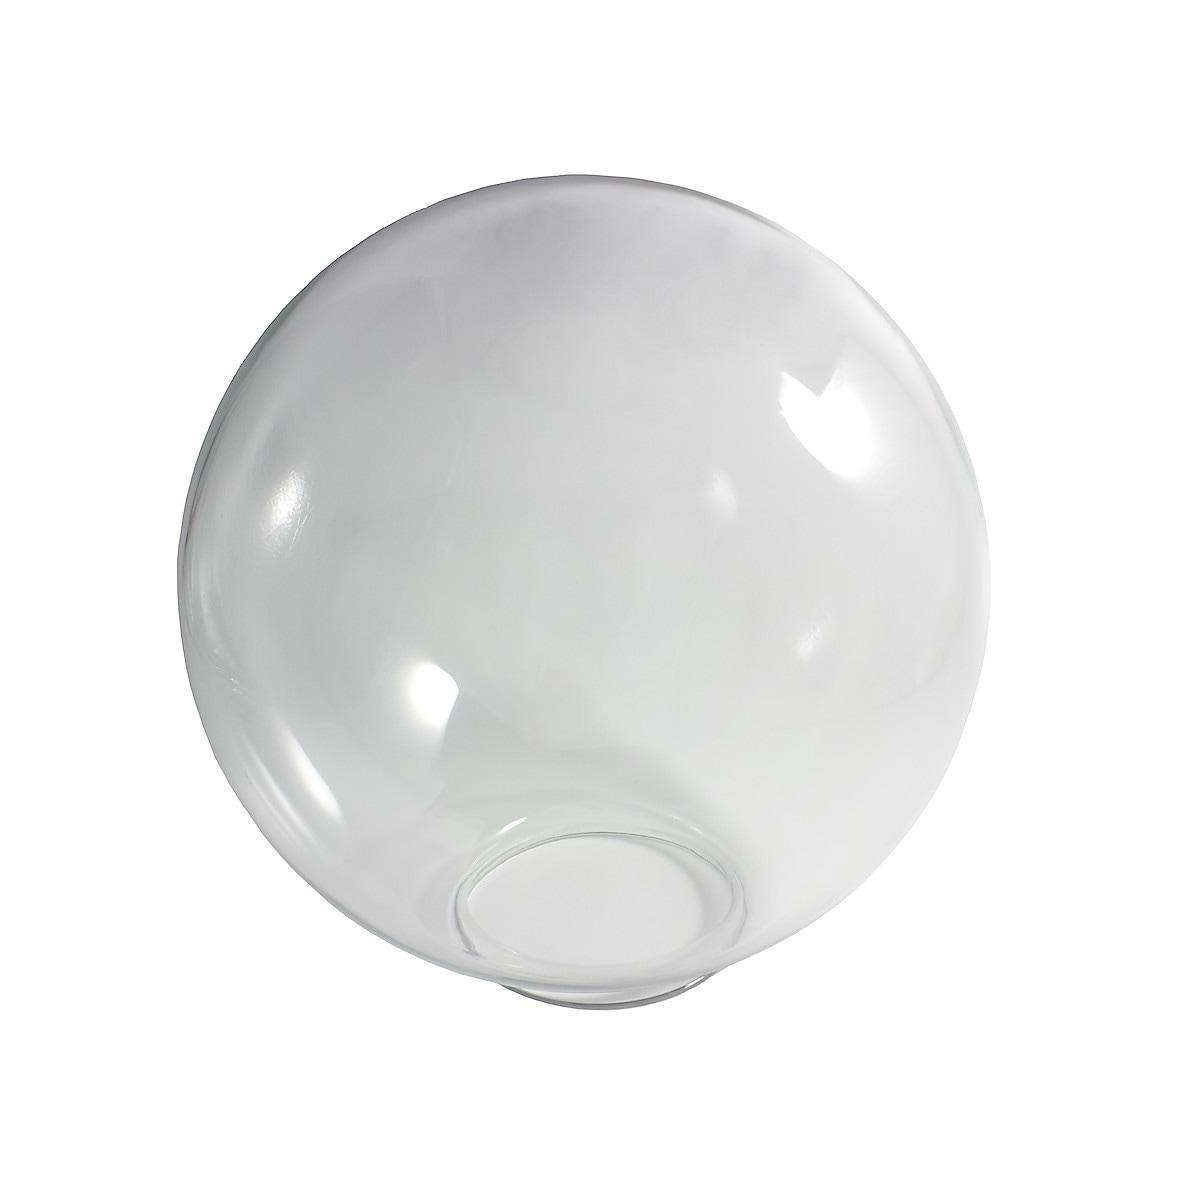 Glass Konstsmide Orion 470-001